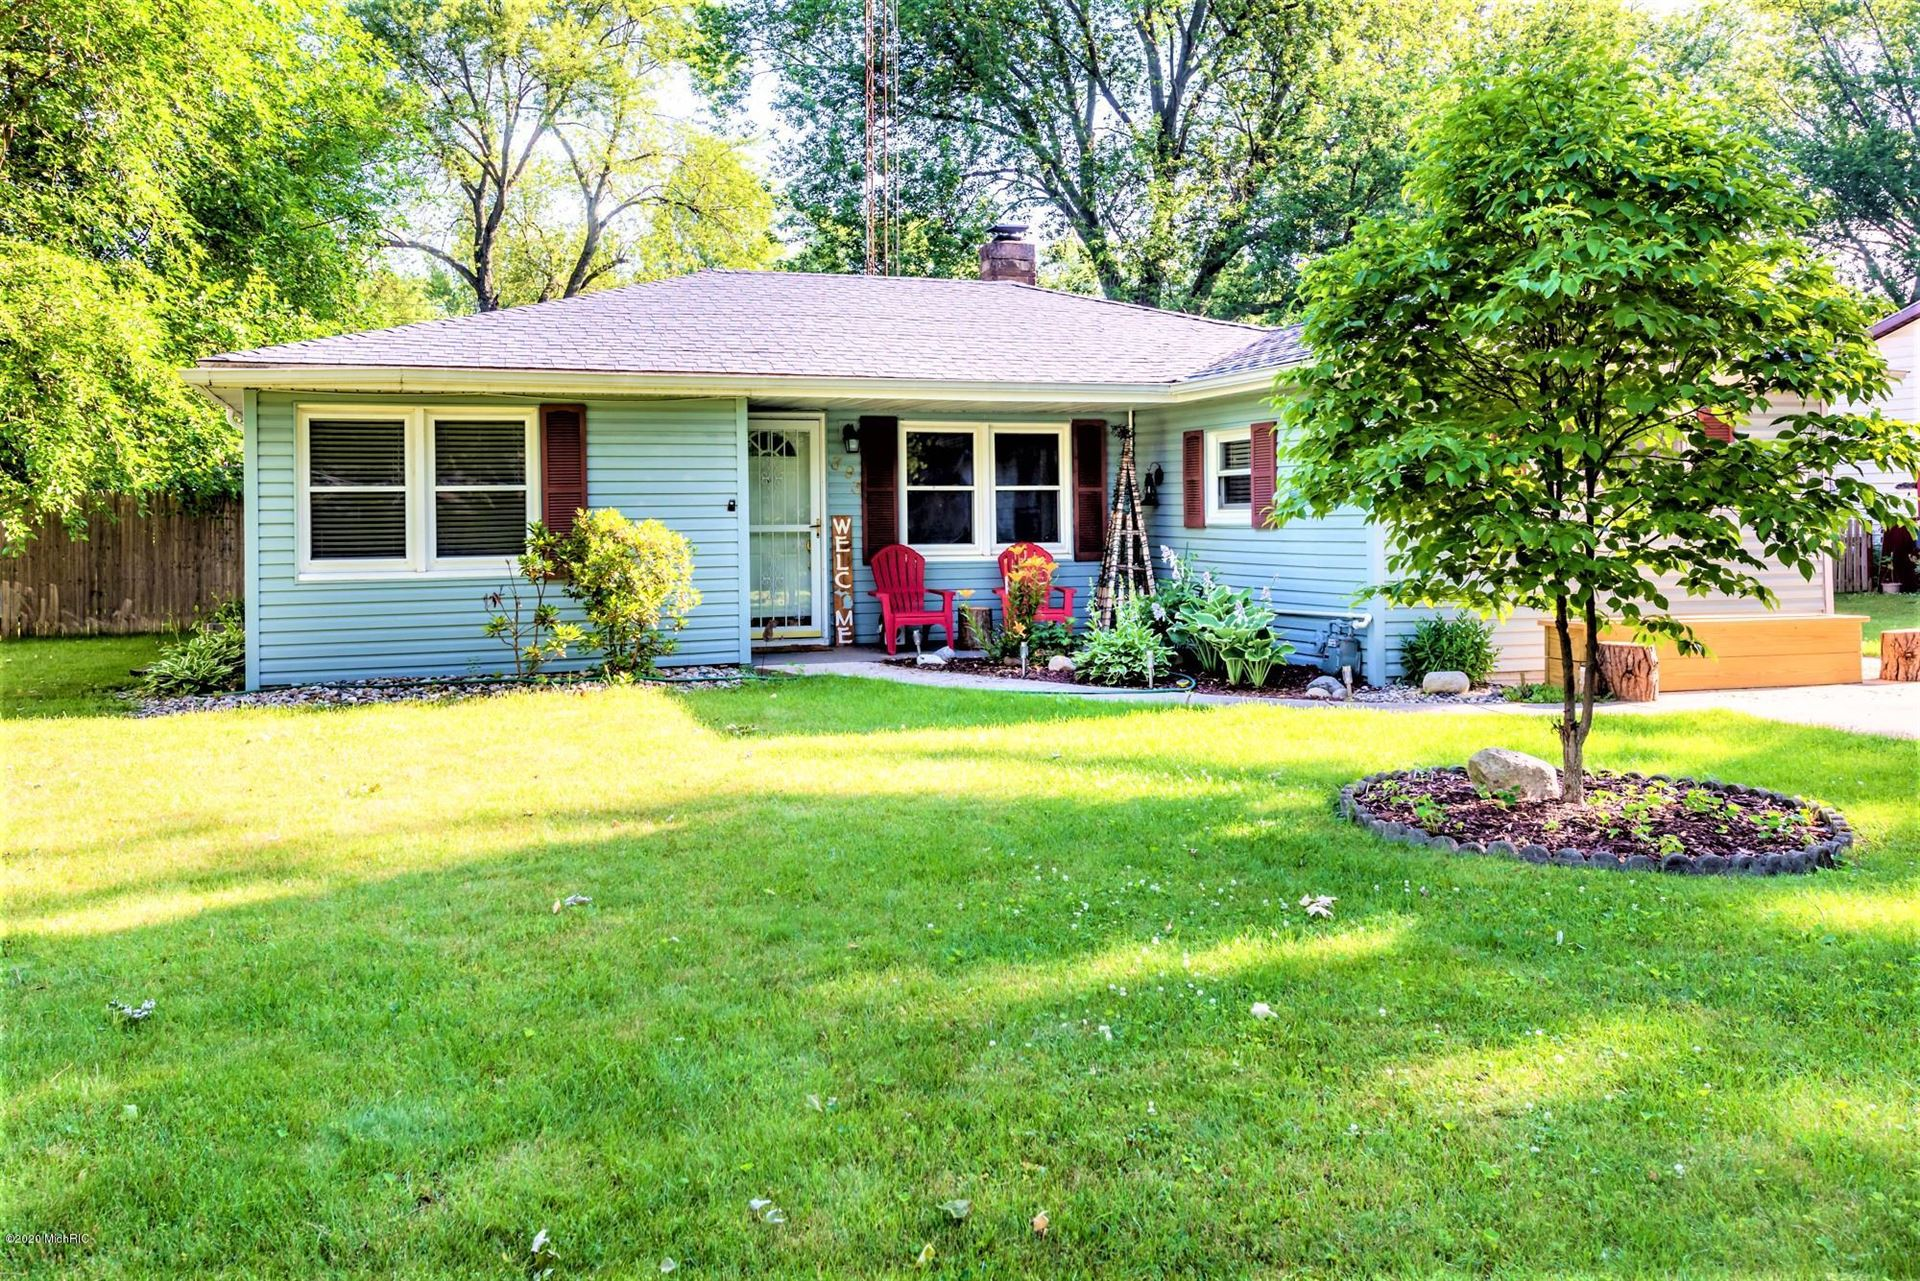 393 Gary Avenue, Benton Harbor, MI 49022 - MLS#: 20024770